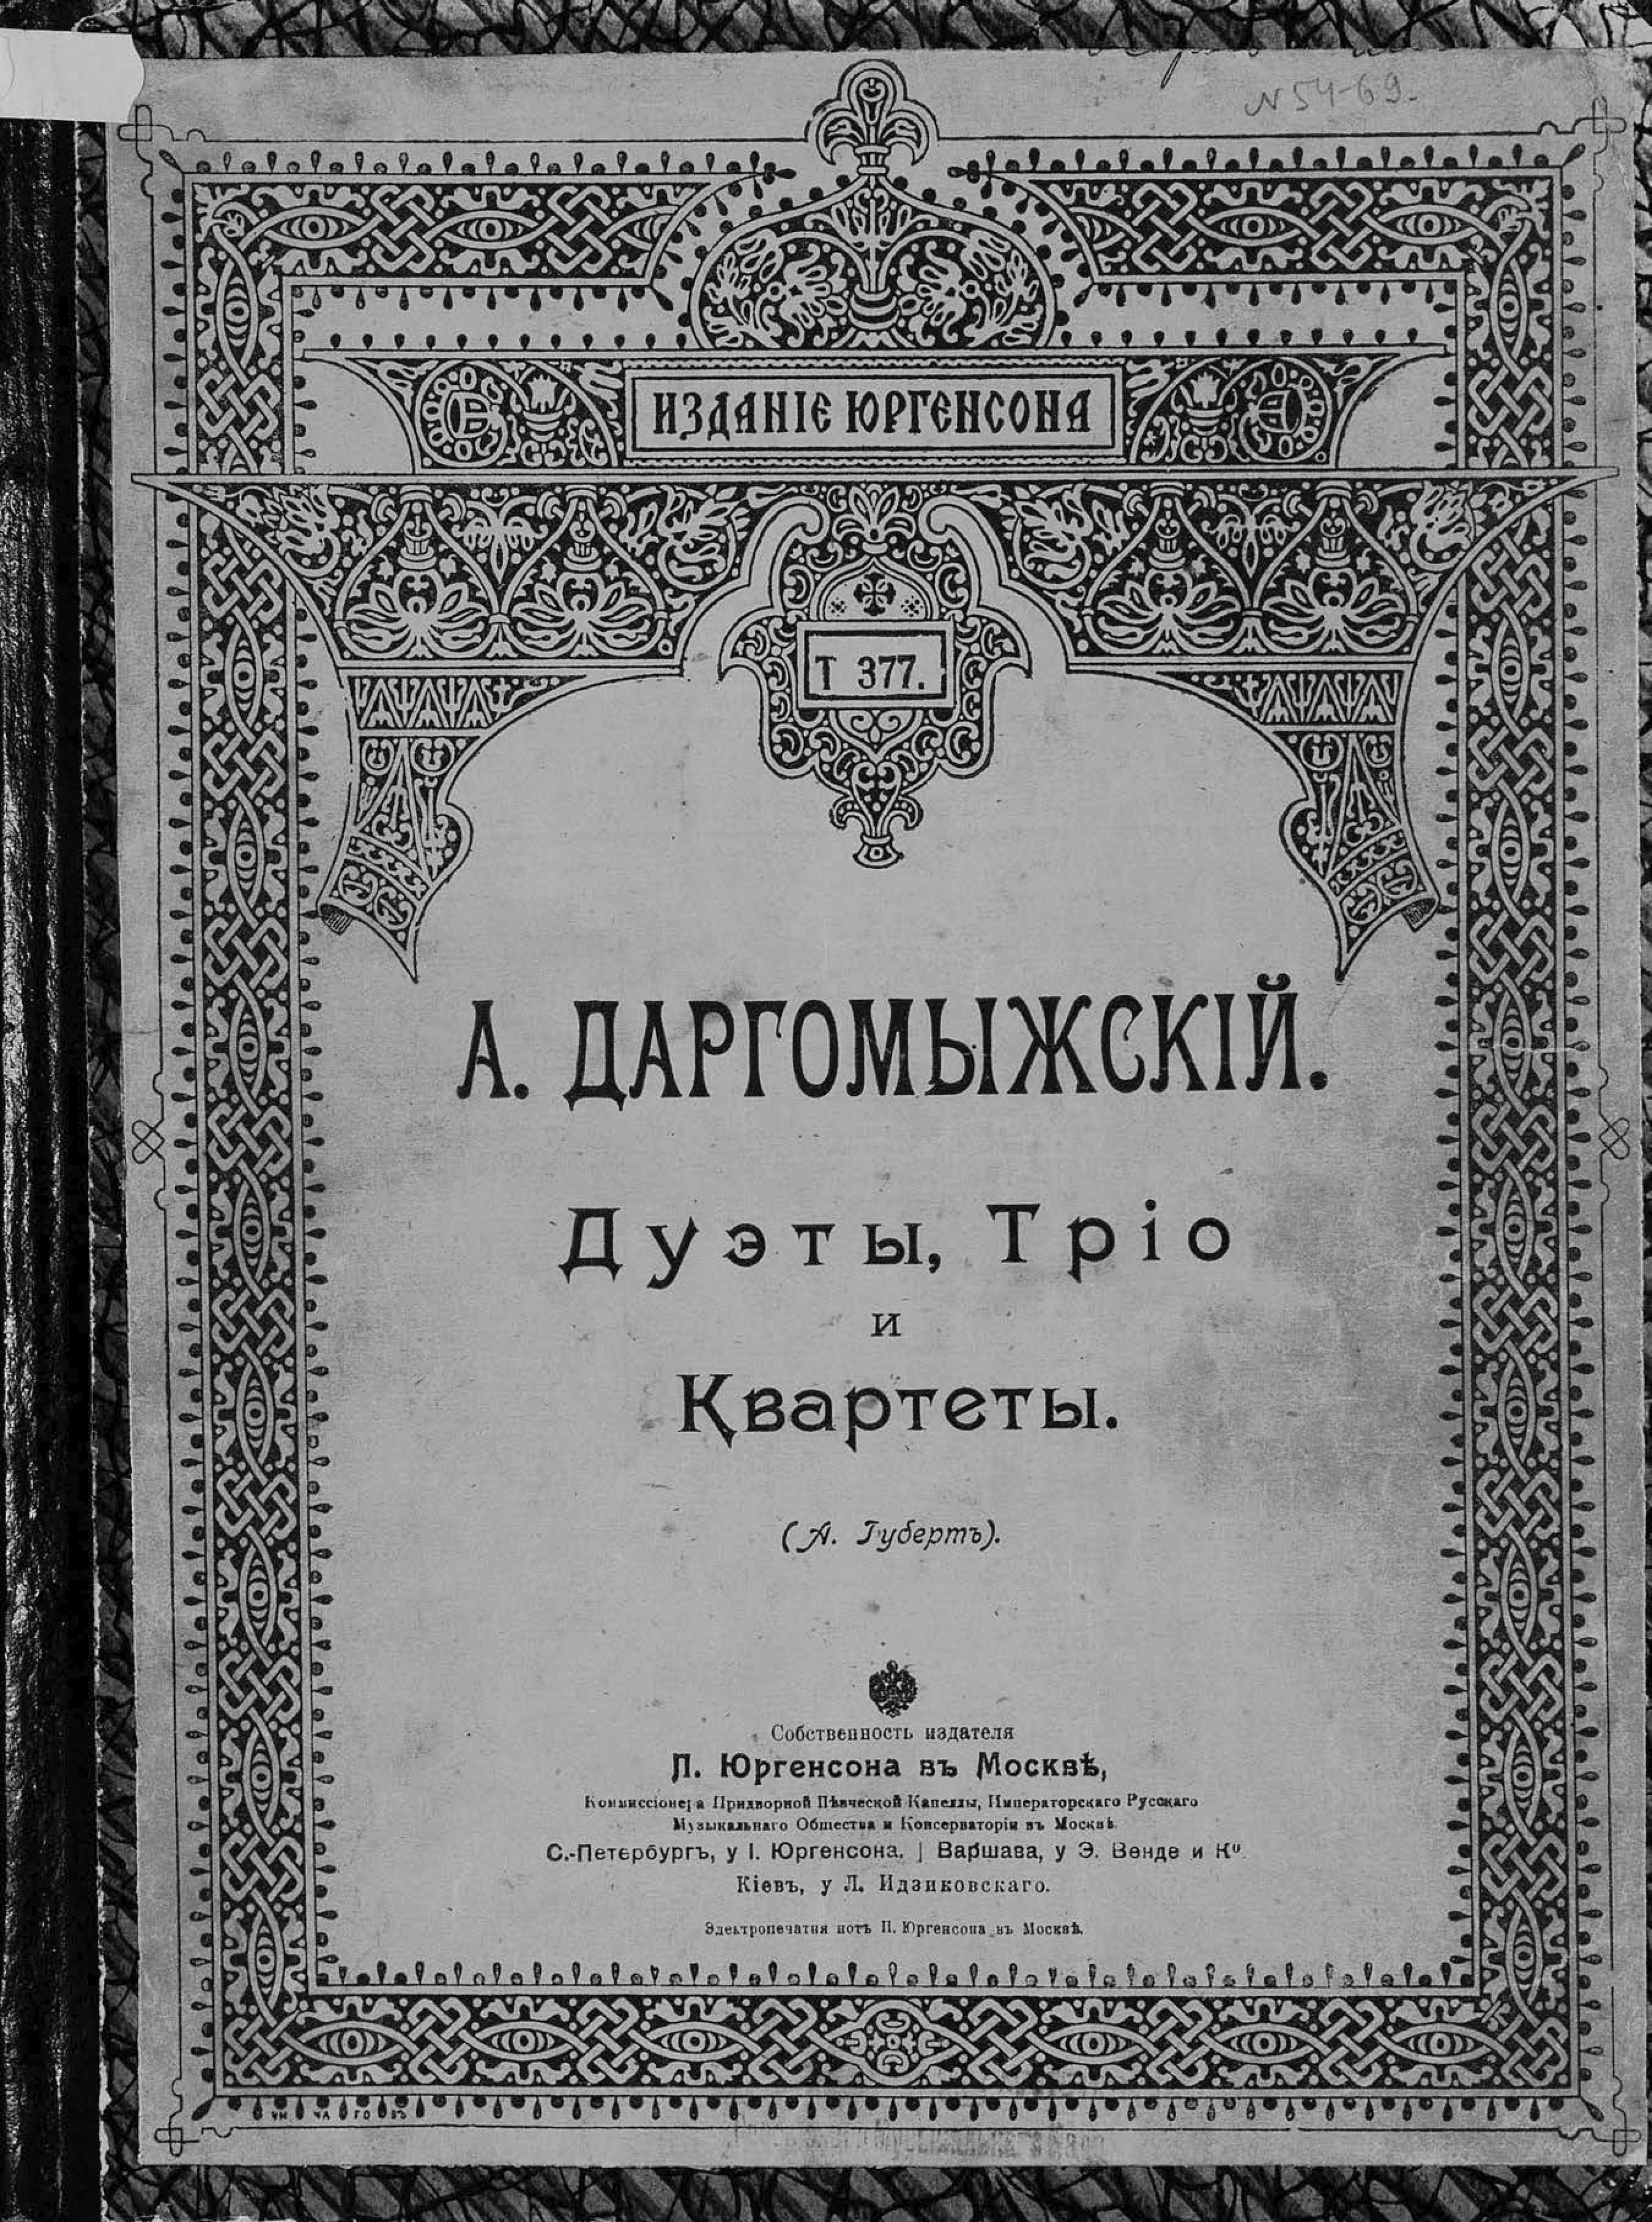 Александр Сергеевич Даргомыжский Дуэты, трио и квартеты цветовые дуэты химия